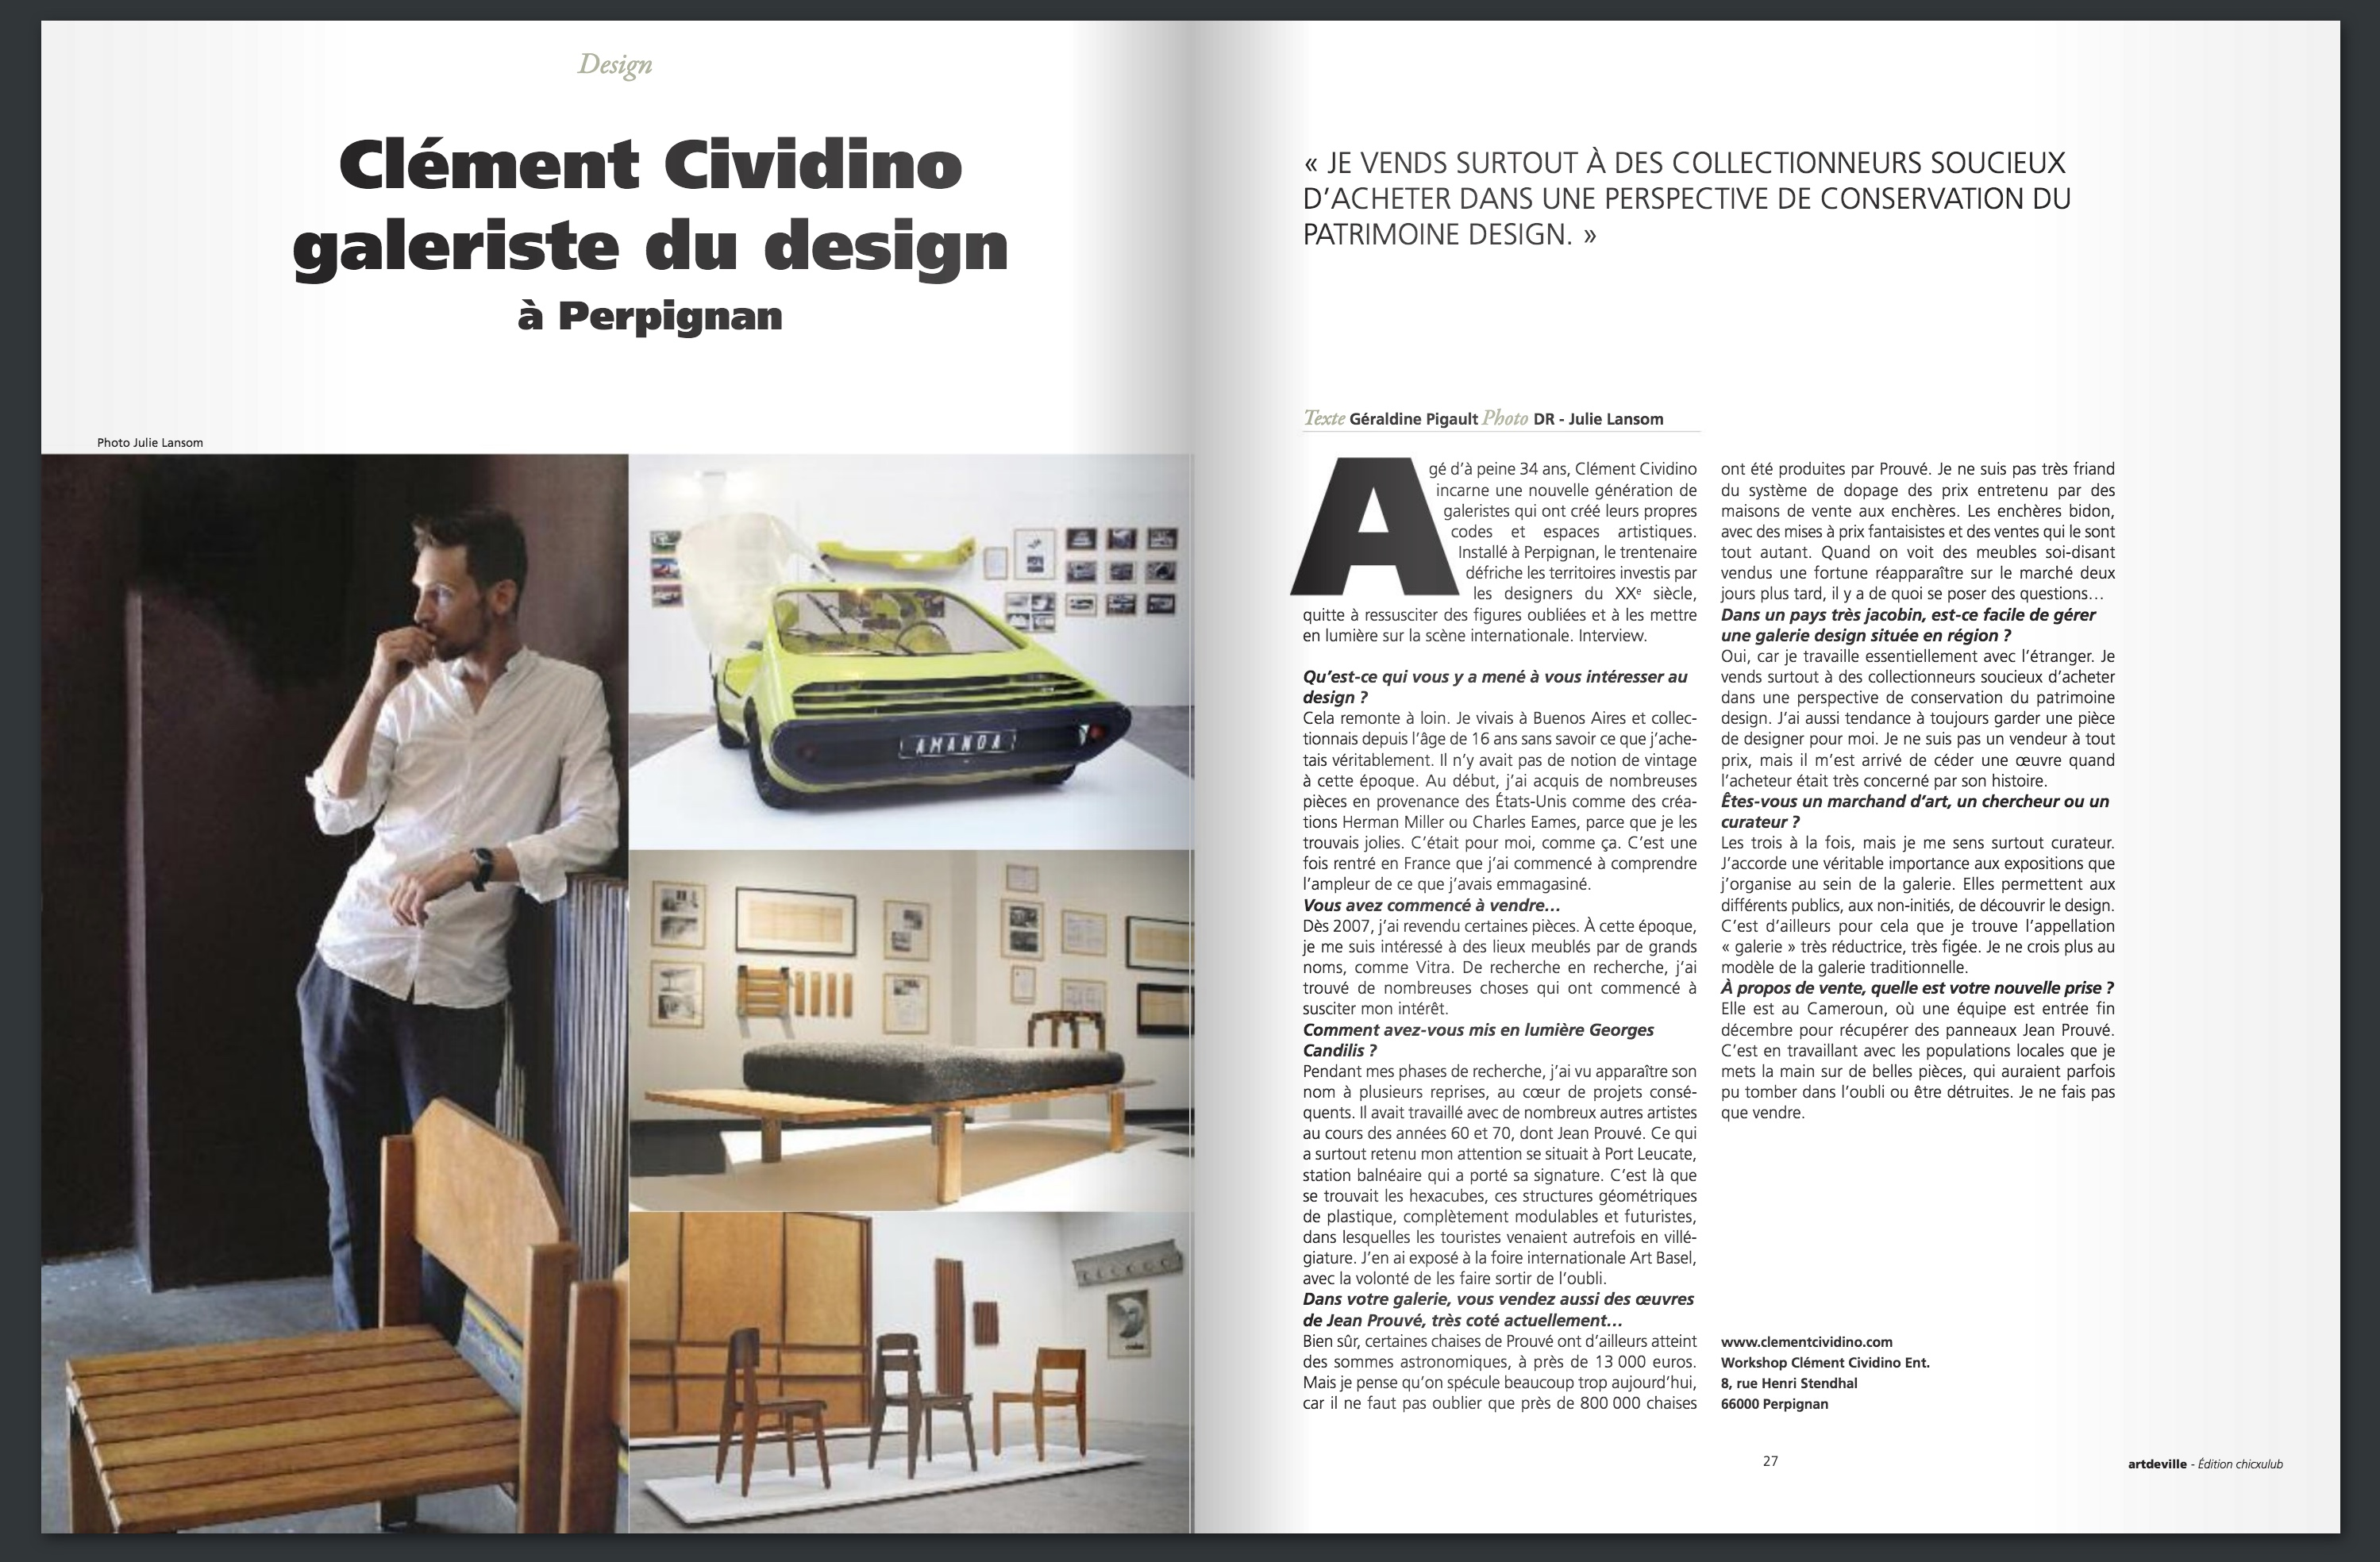 clement_cividino_design_candilis_artdeville_